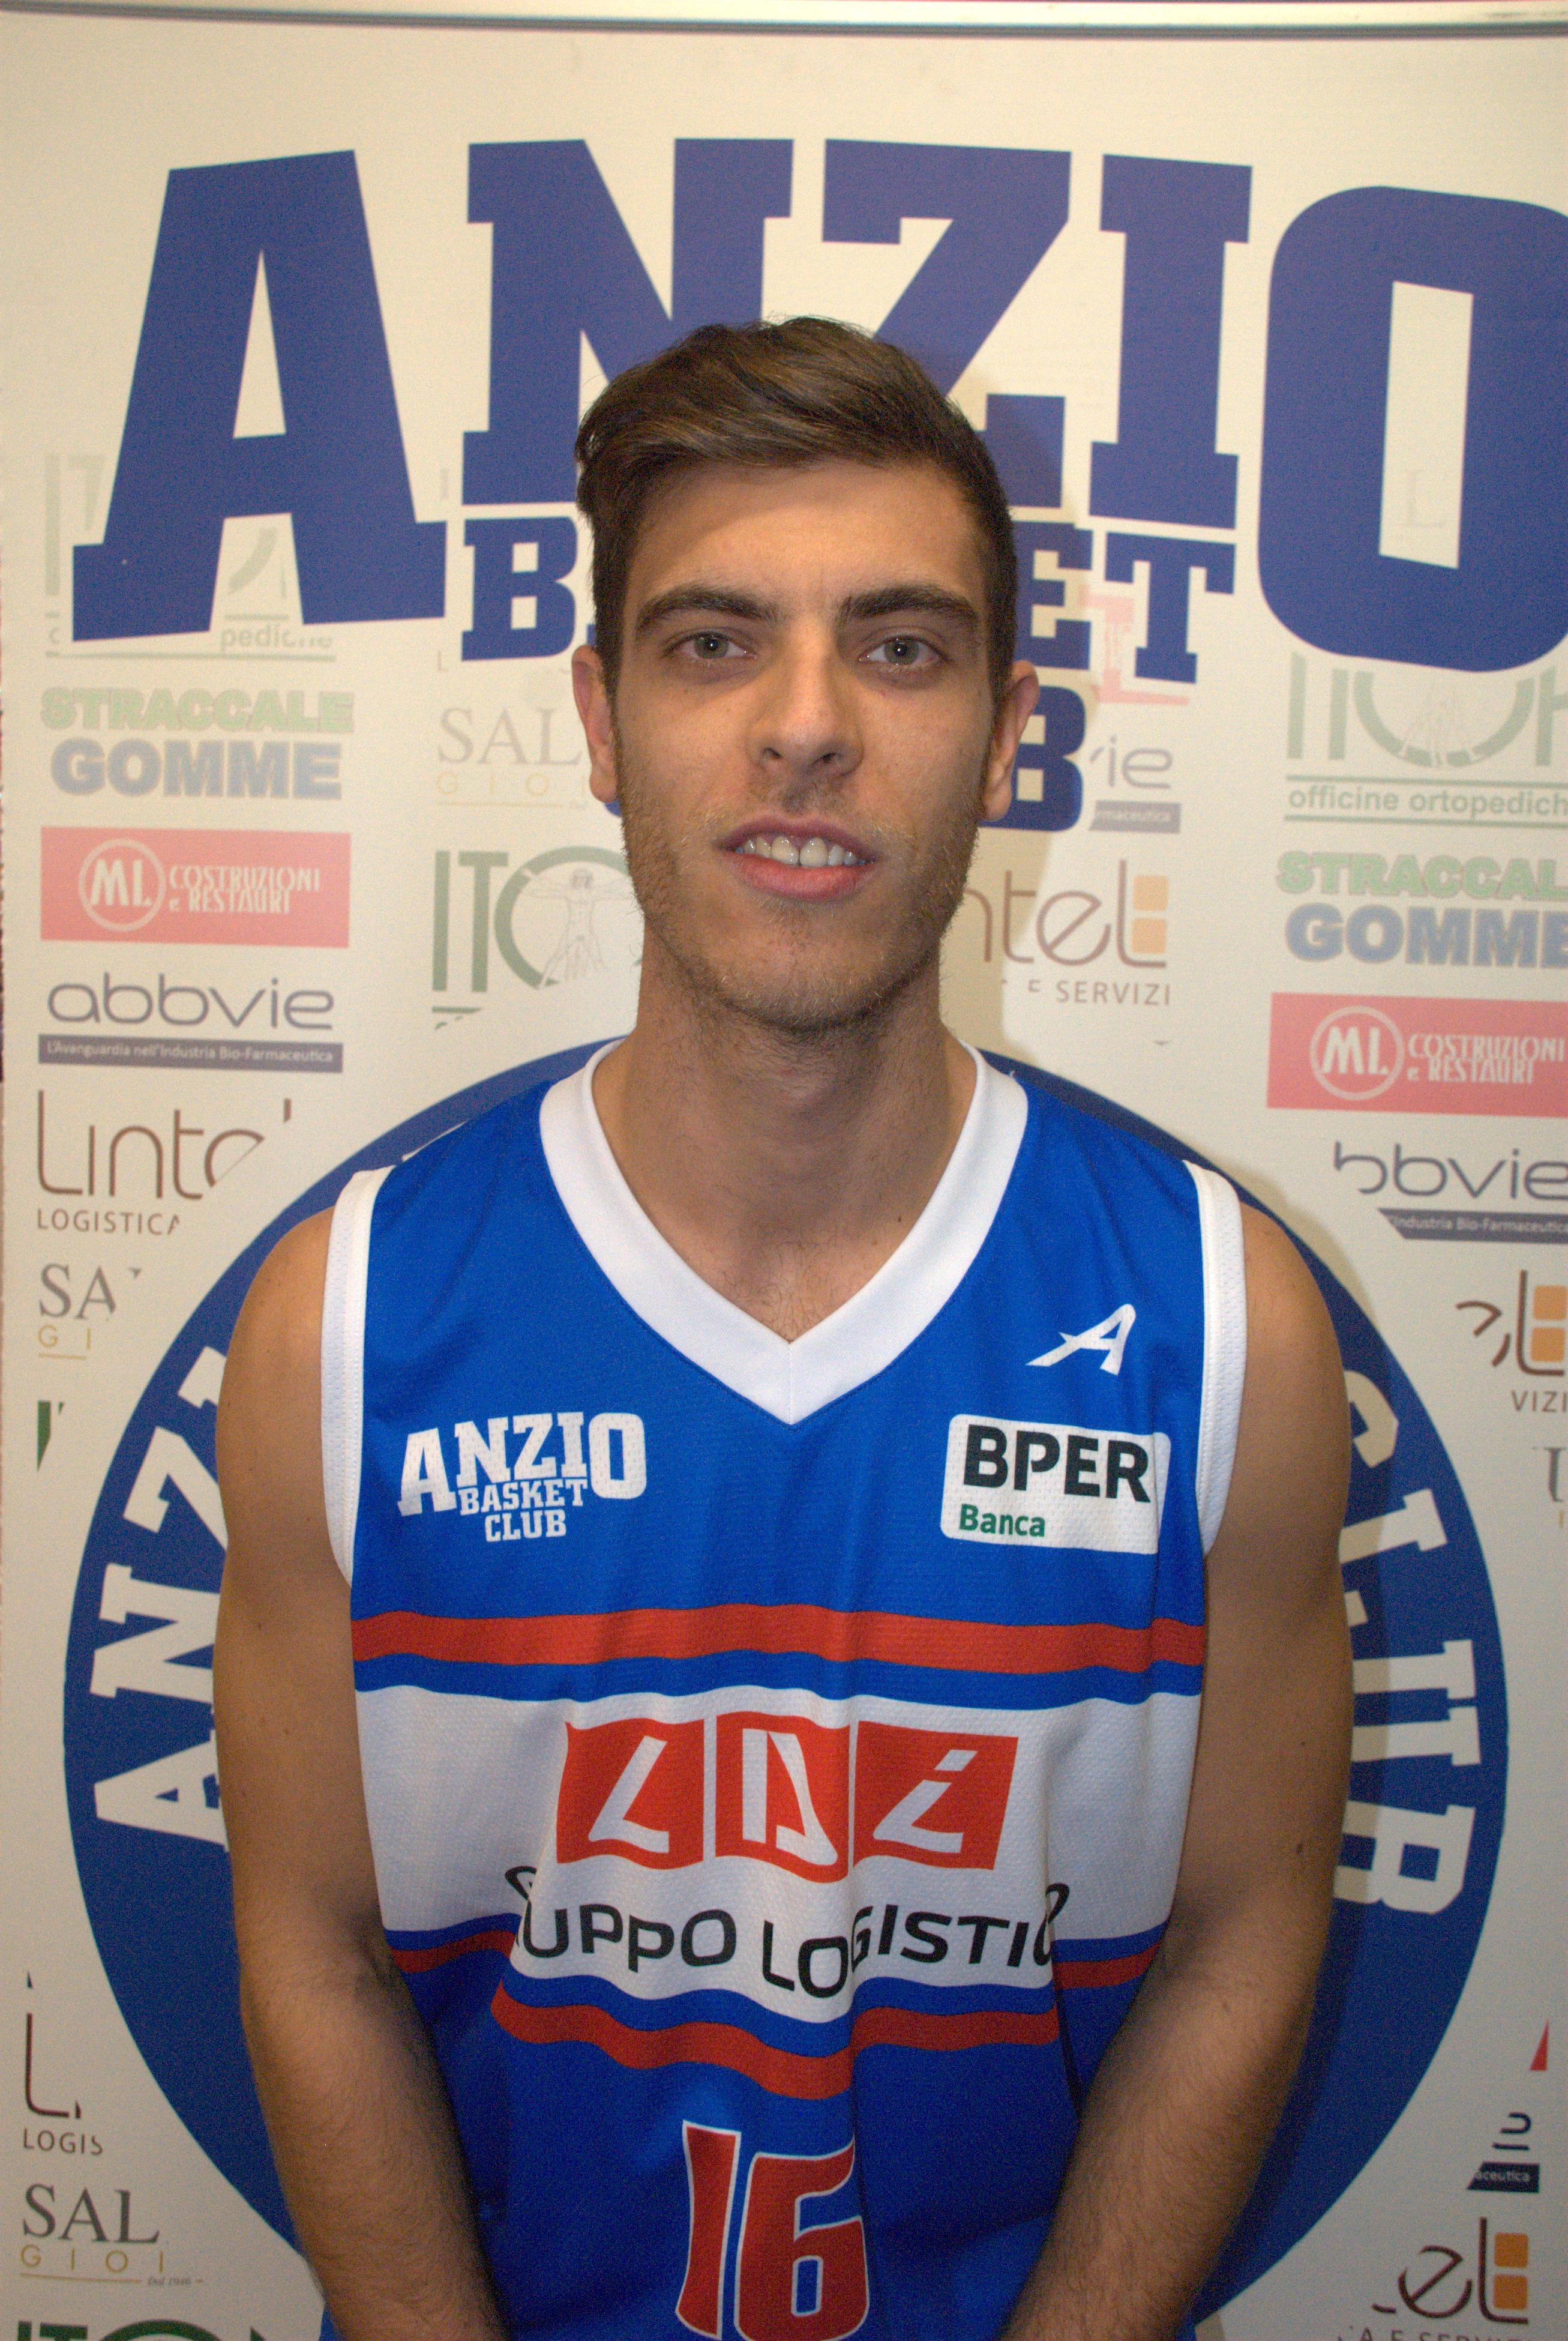 Davide Lerro